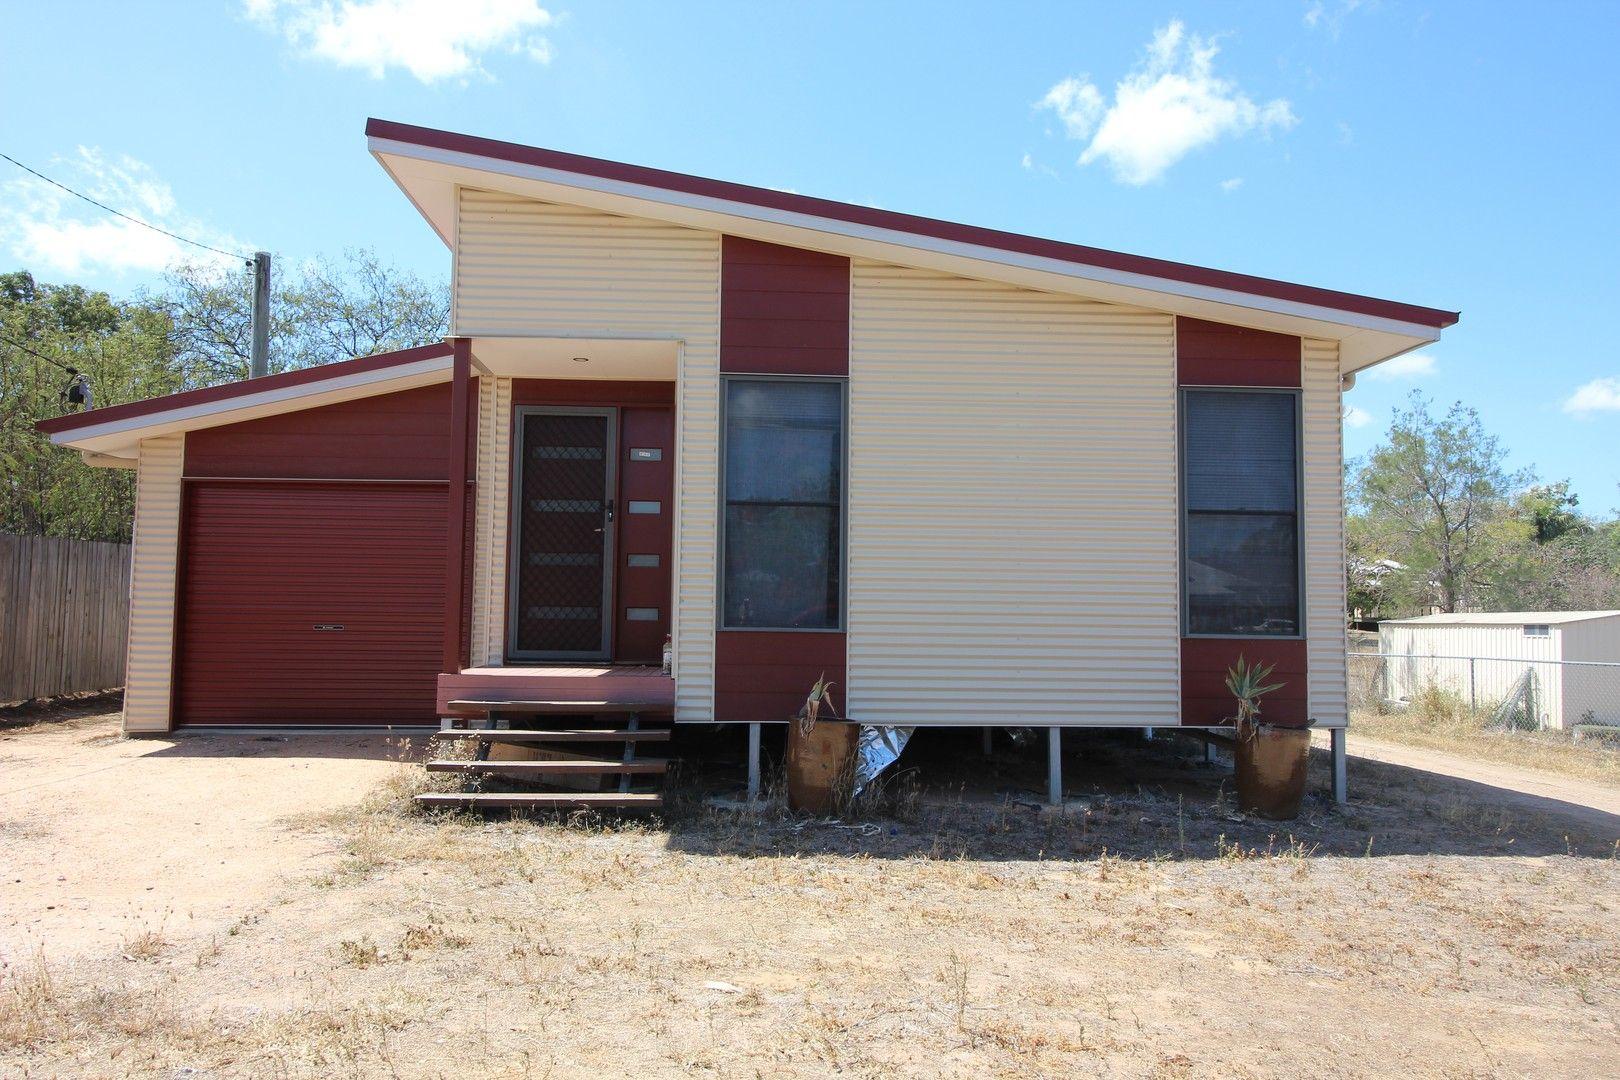 14 Boorunbeh St, Gayndah QLD 4625, Image 0